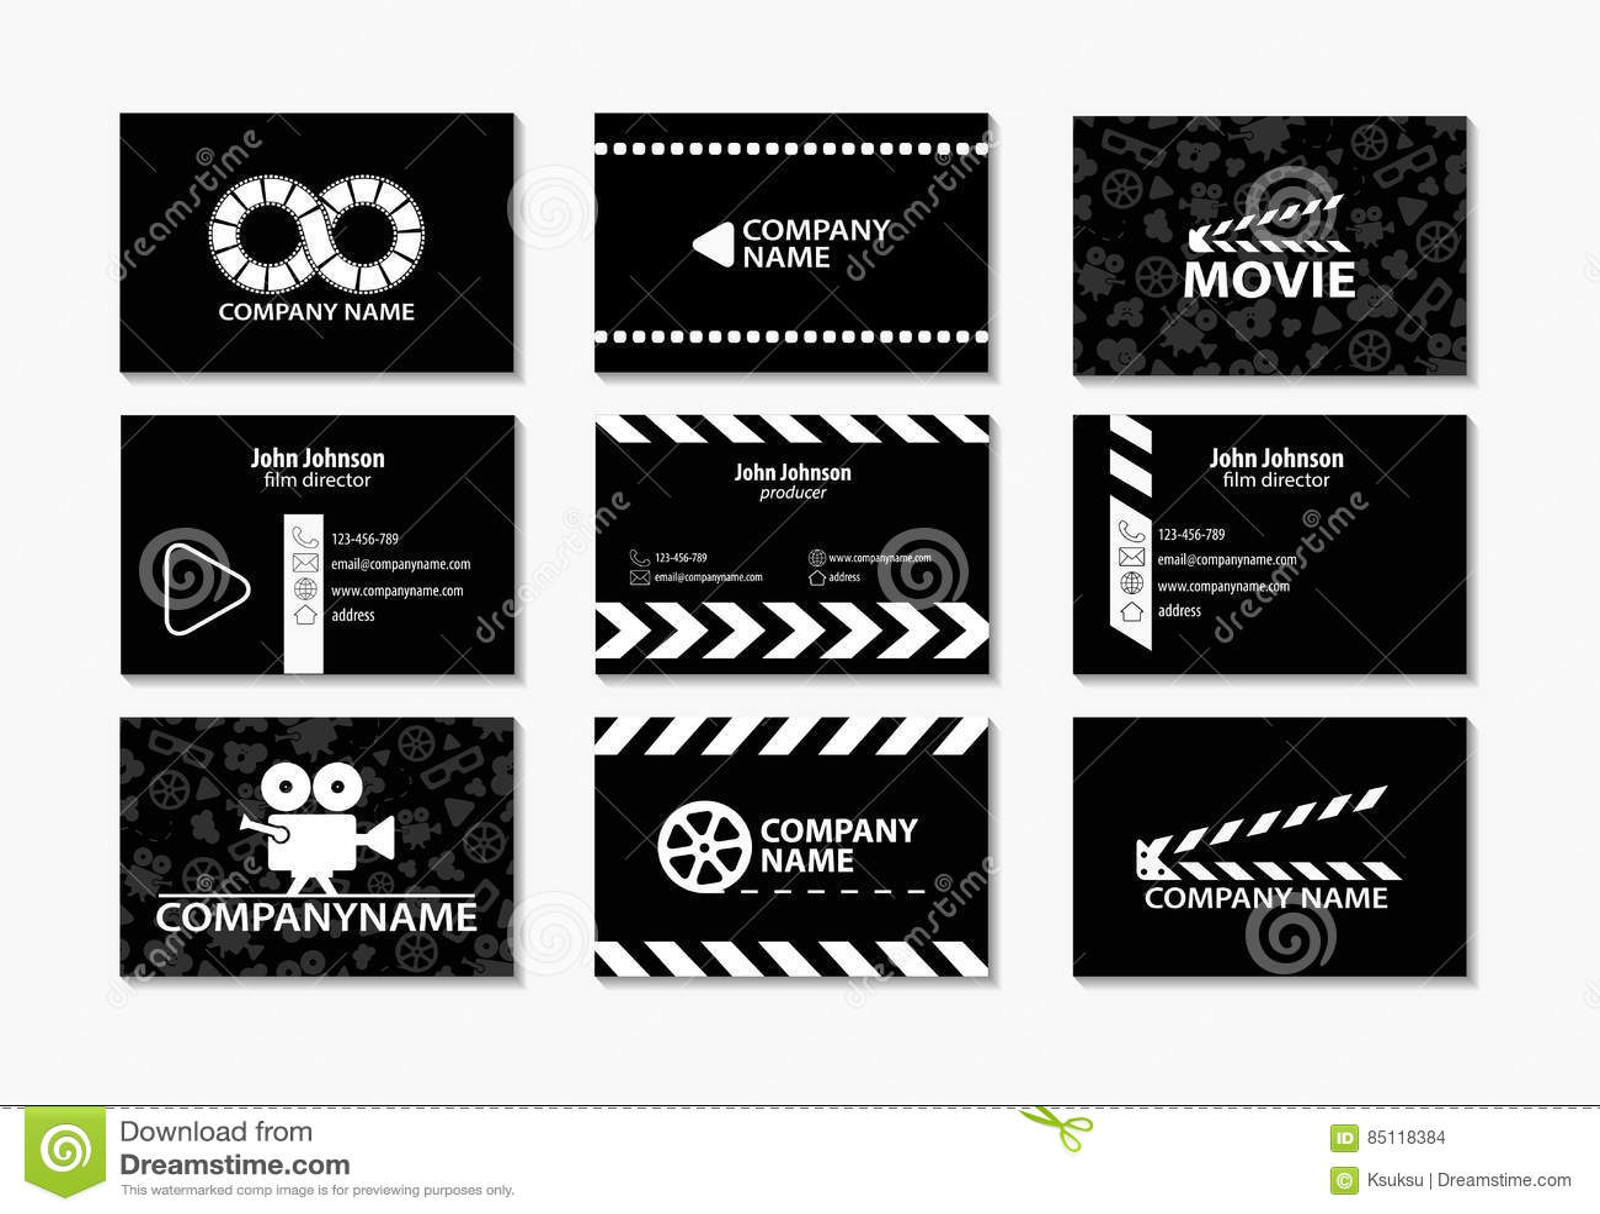 business plan maker 2012 movie